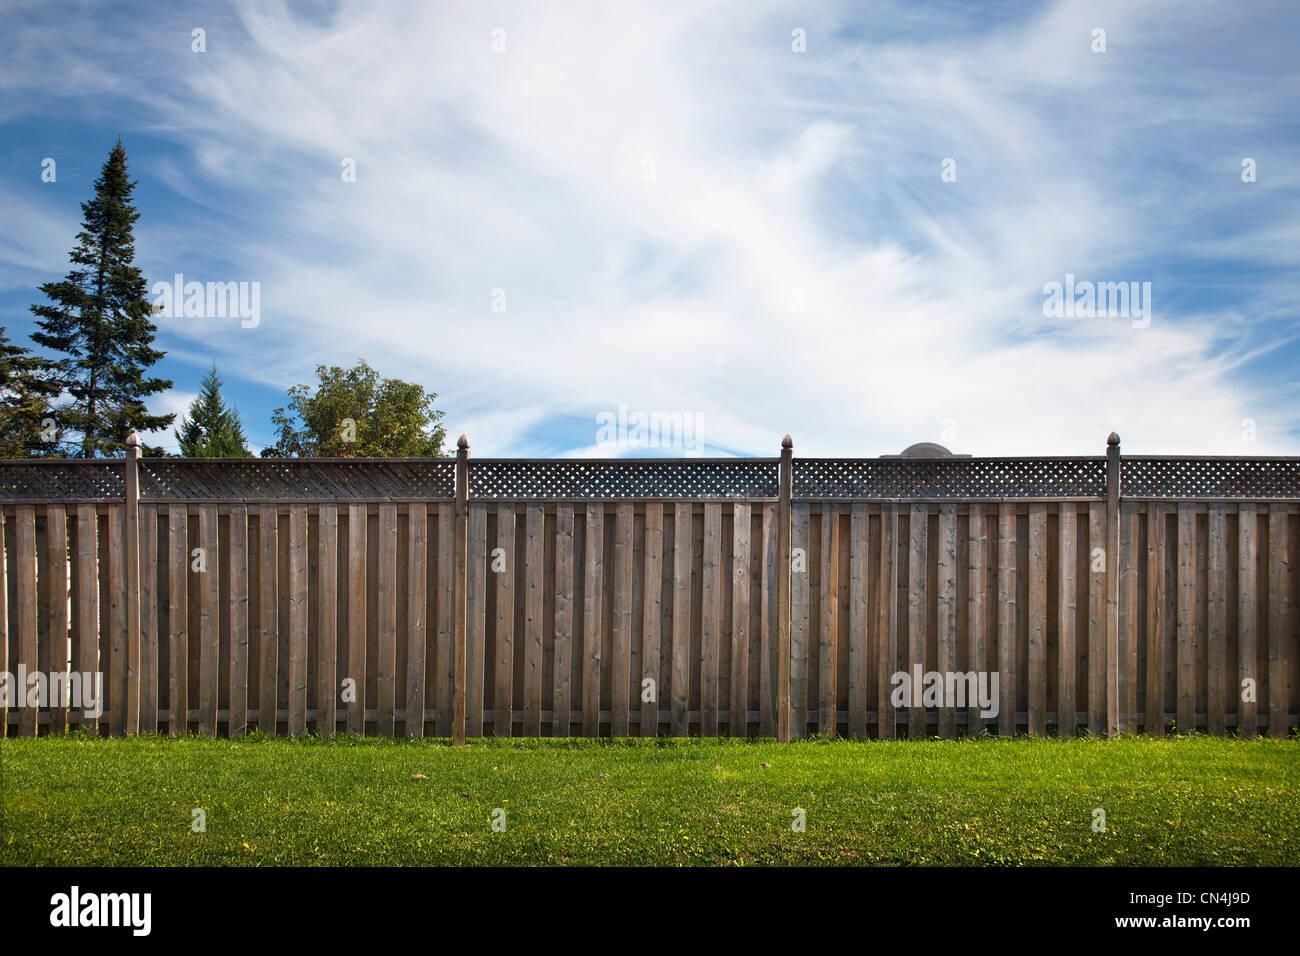 Wooden garden fence - Stock Image